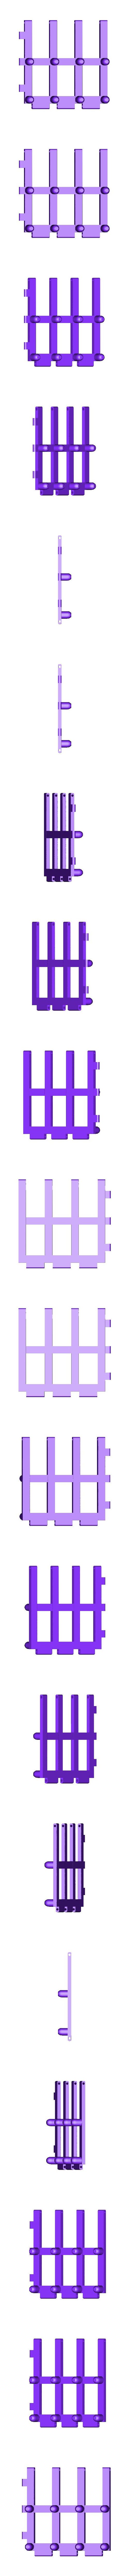 Romulan_belt_x3.stl Download free STL file Romulan Harness • 3D print template, poblocki1982